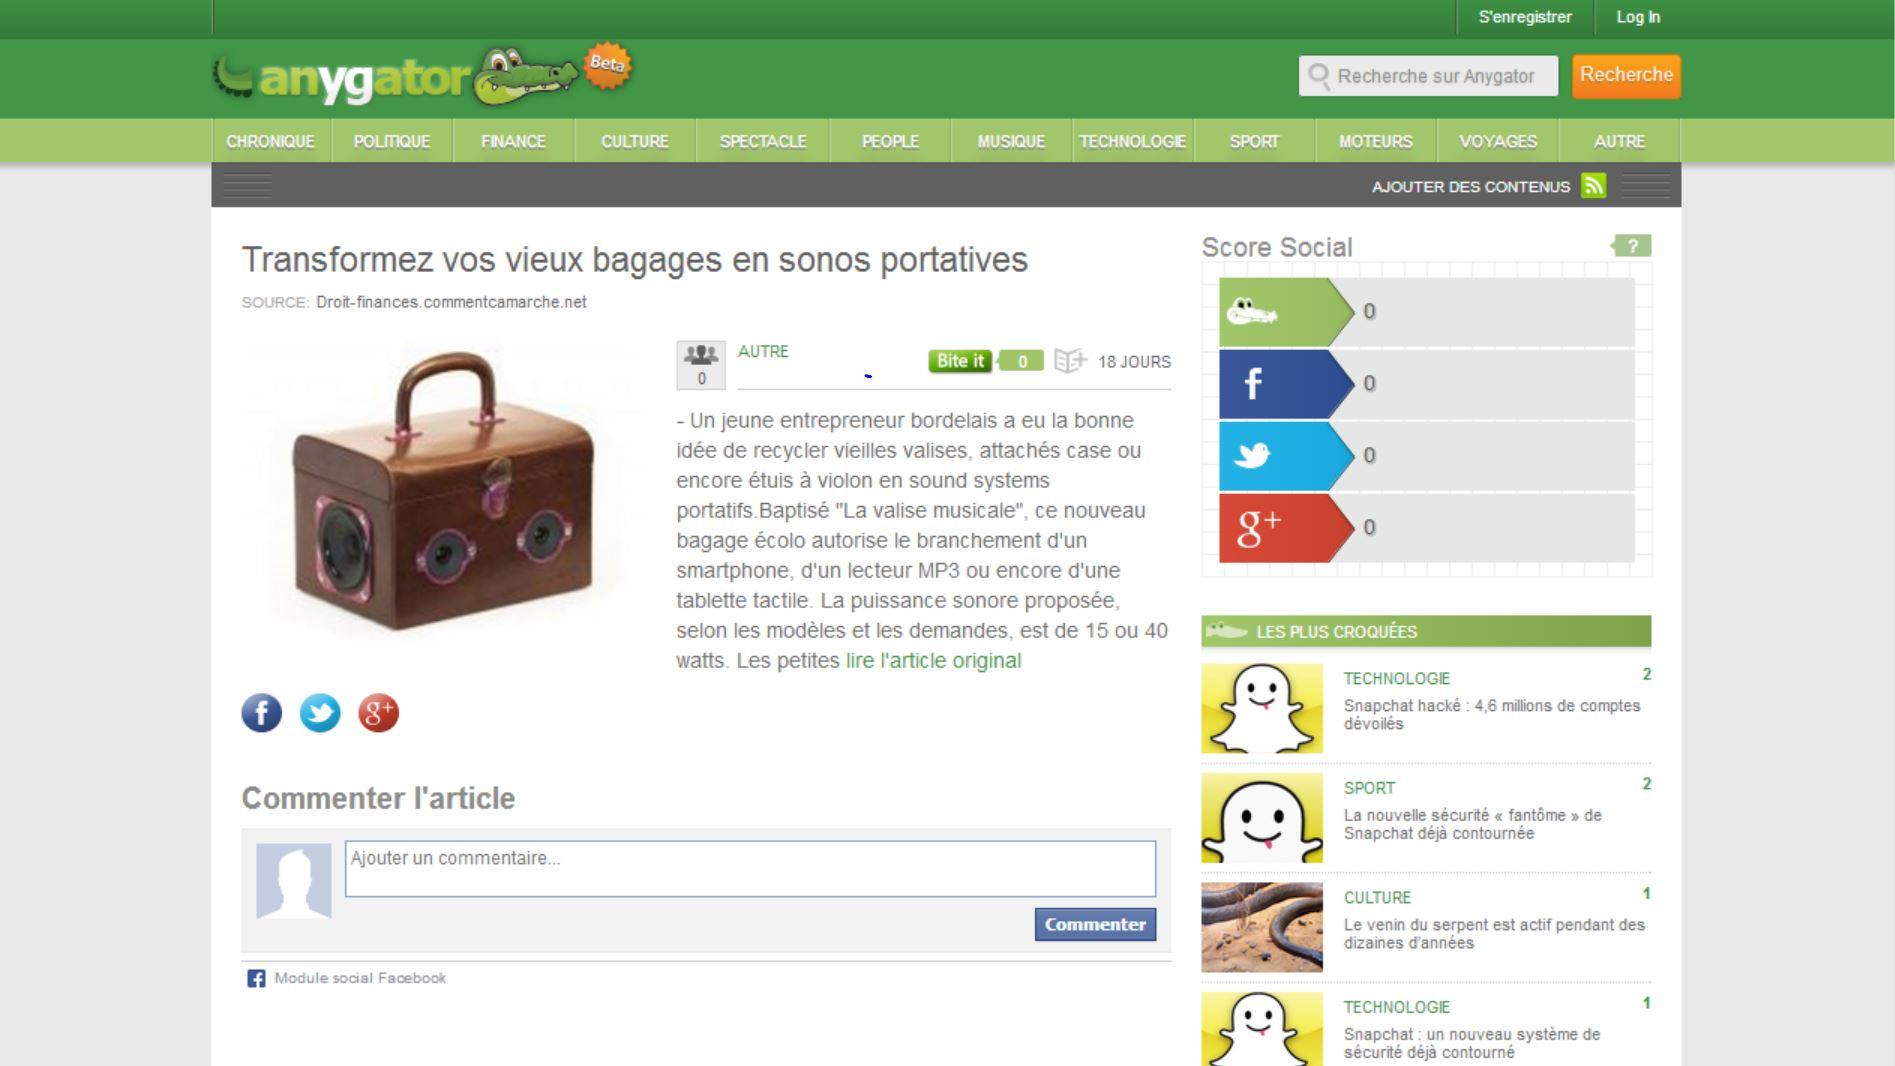 Valise Musicale chez Anygator.com